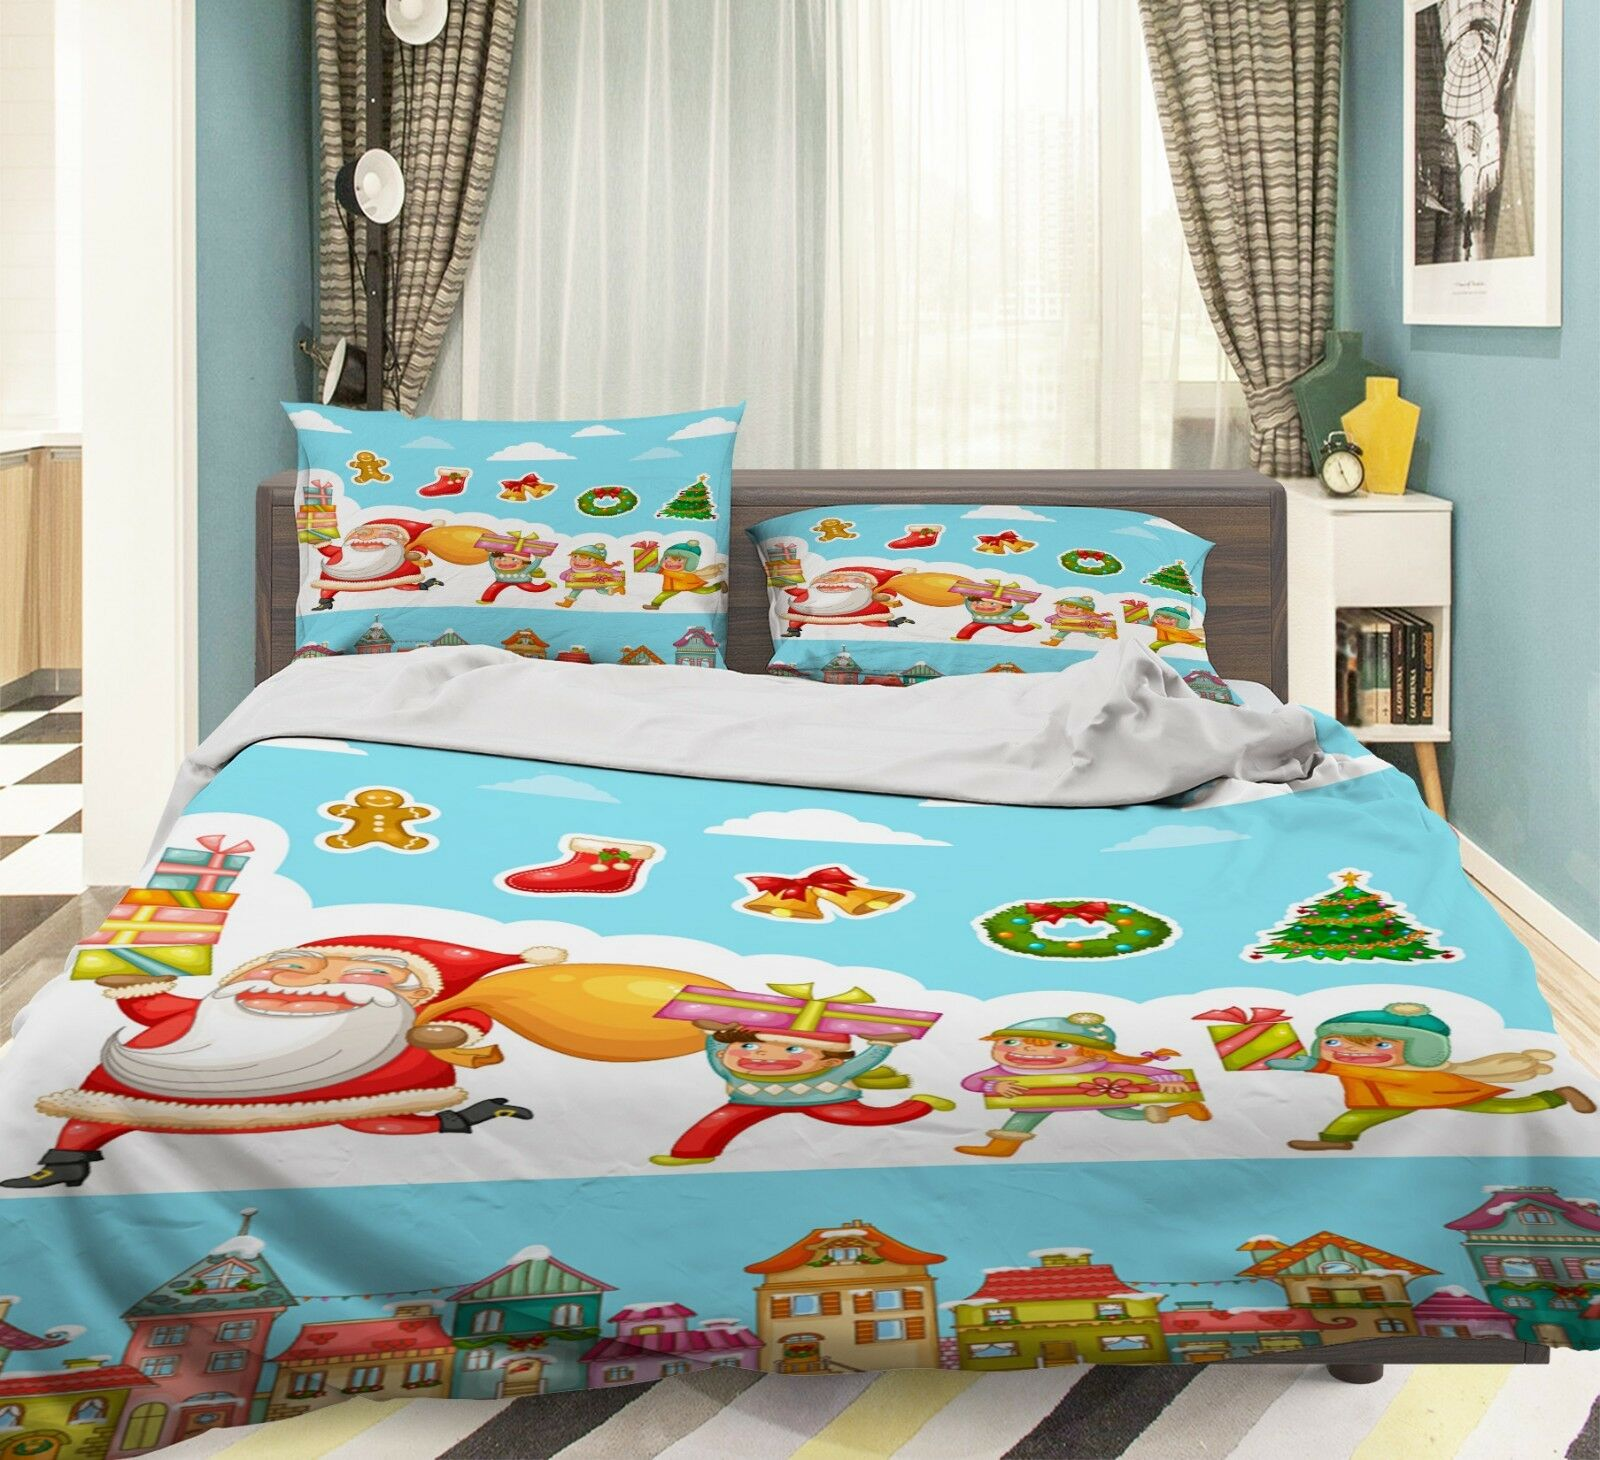 3D Weihnachtskarten Xmas 681 Bett Kissenbez im Kombibereich 65533;(im Kombibereich 65533ge Steppen Duvet Decken Set Single DE